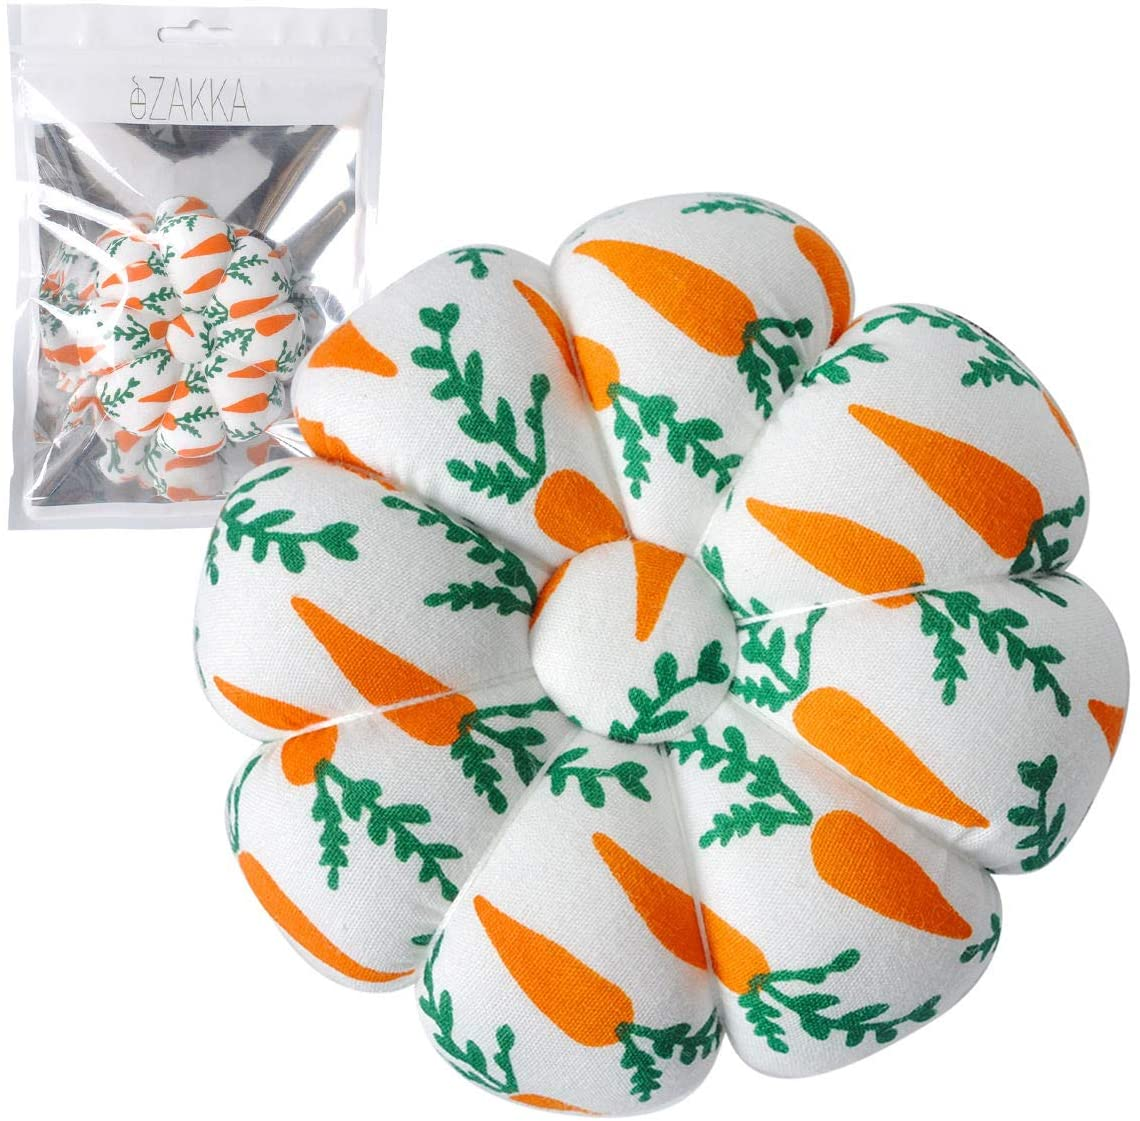 eZAKKA Wrist Pin Cushions Sewing Needle Cushion Holder Band Wearable Pincushions for Sewing (Carrot)